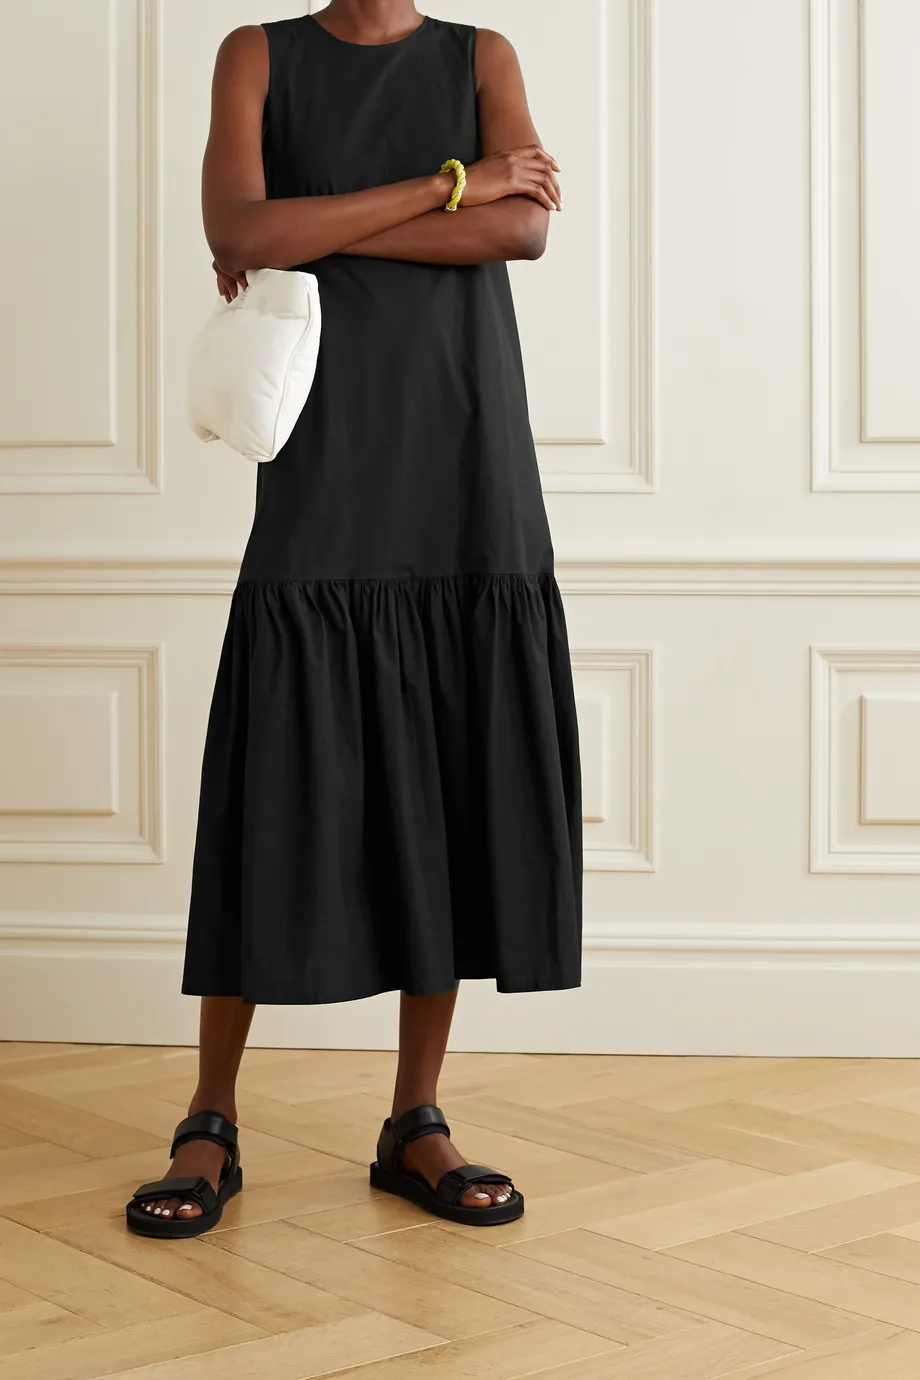 Pin By Nadya On Fashion In 2021 Cotton Poplin Midi Dress Poplin [ 1380 x 920 Pixel ]